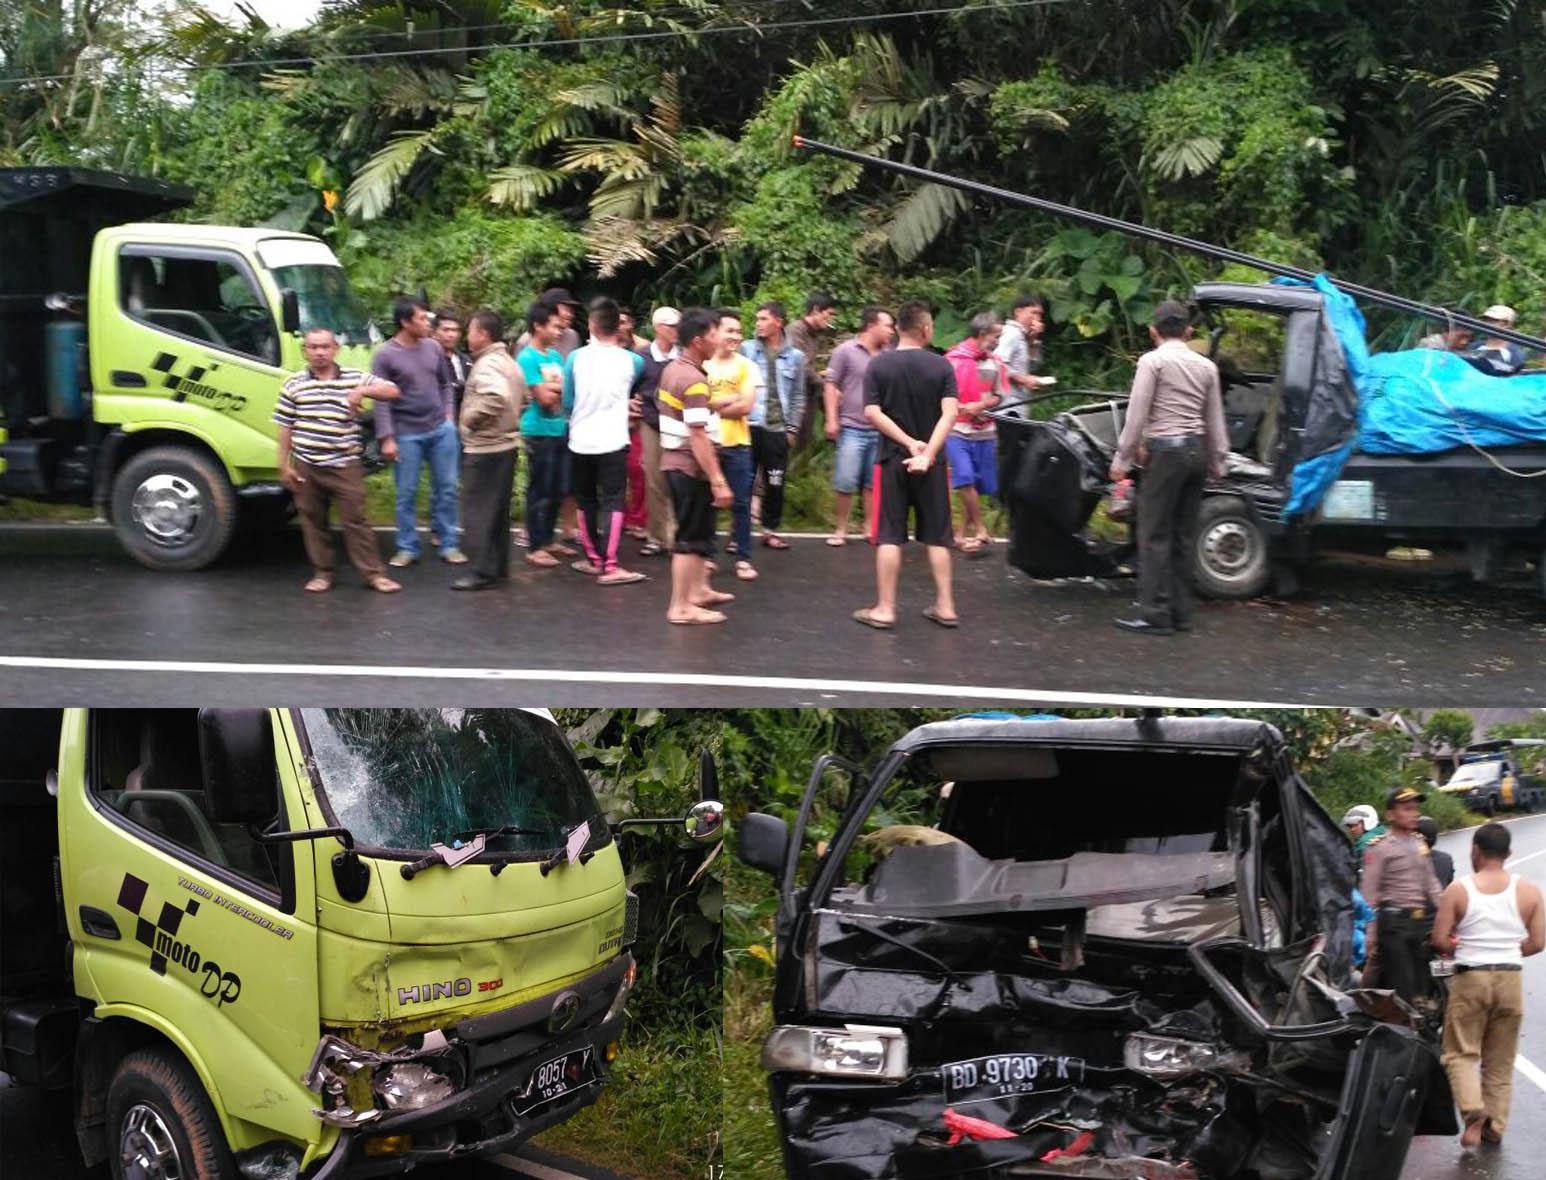 Polisi Evakuasi Korban Kecelakaan Truck vs Futura